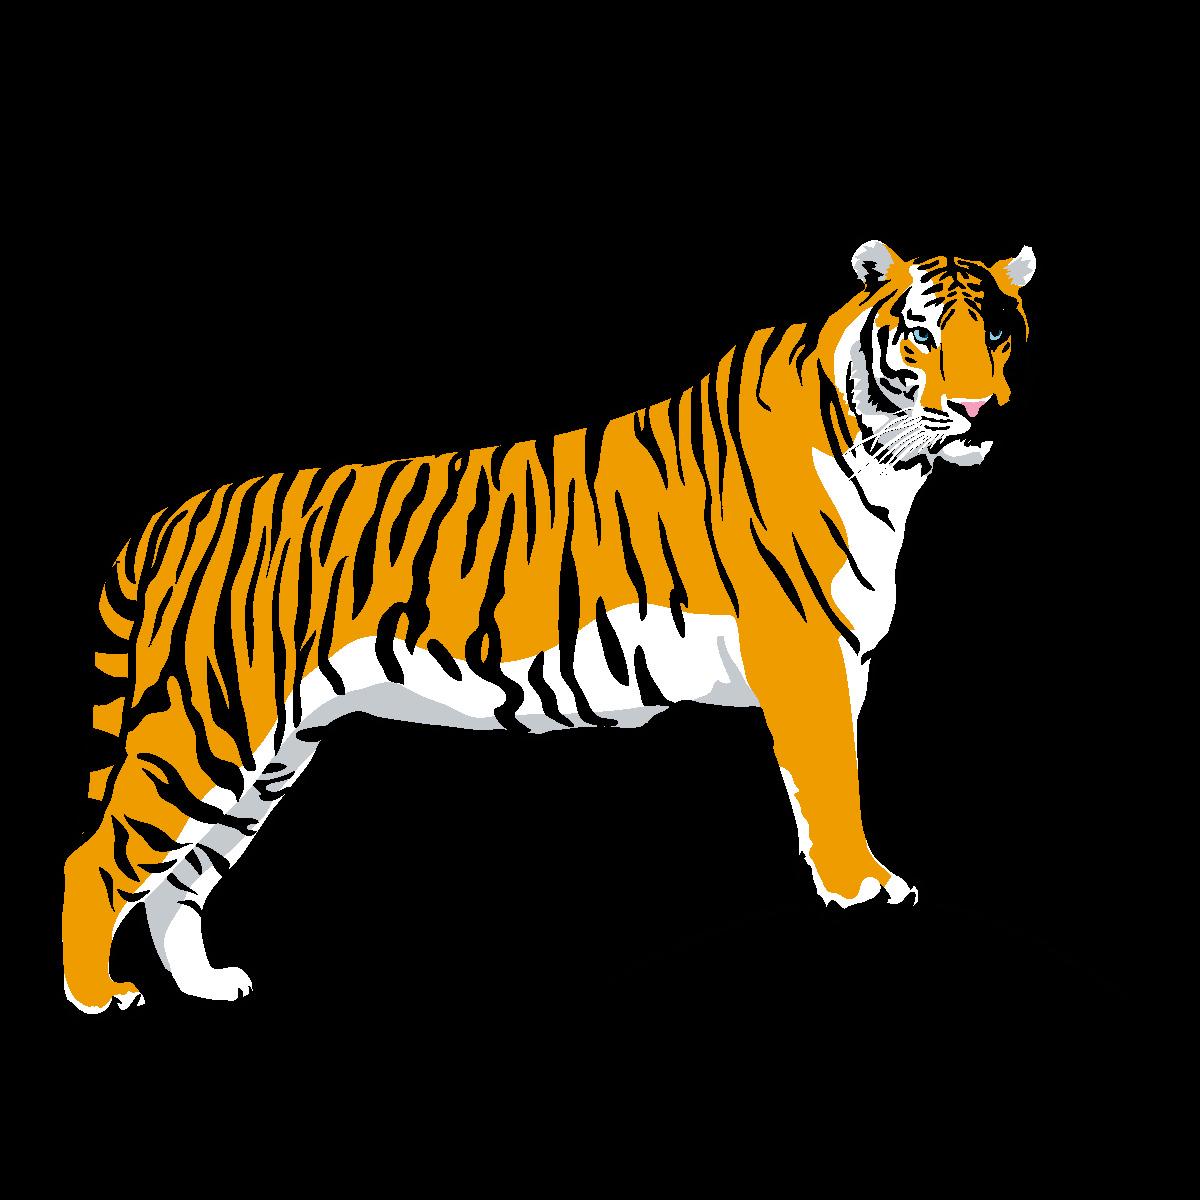 Tiger Clip Art Free Clipart Images Transparent Png.